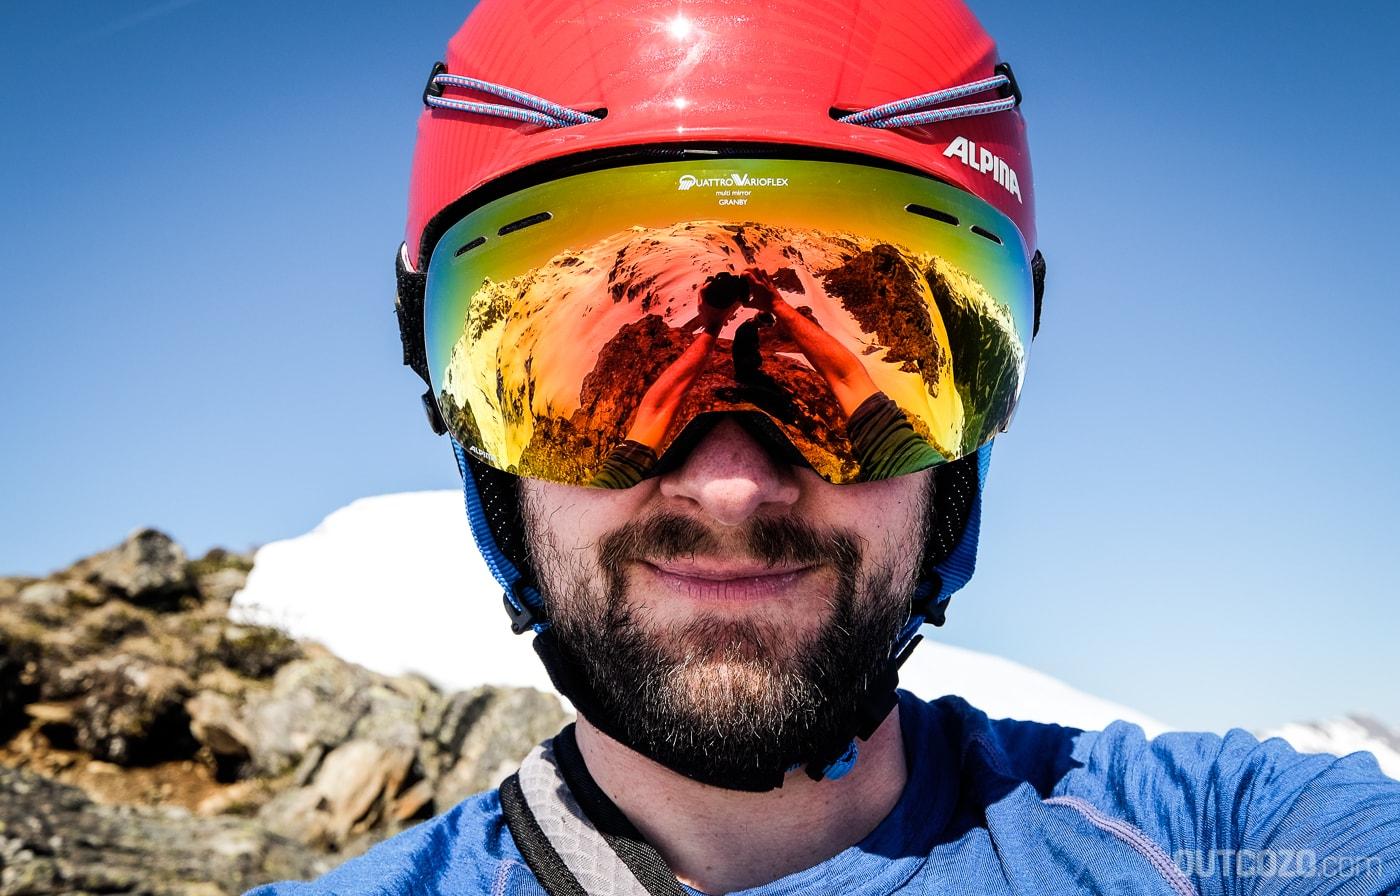 Großes Sichtfeld dank rahmenlosem Design bei der Alpina Granby QVMM